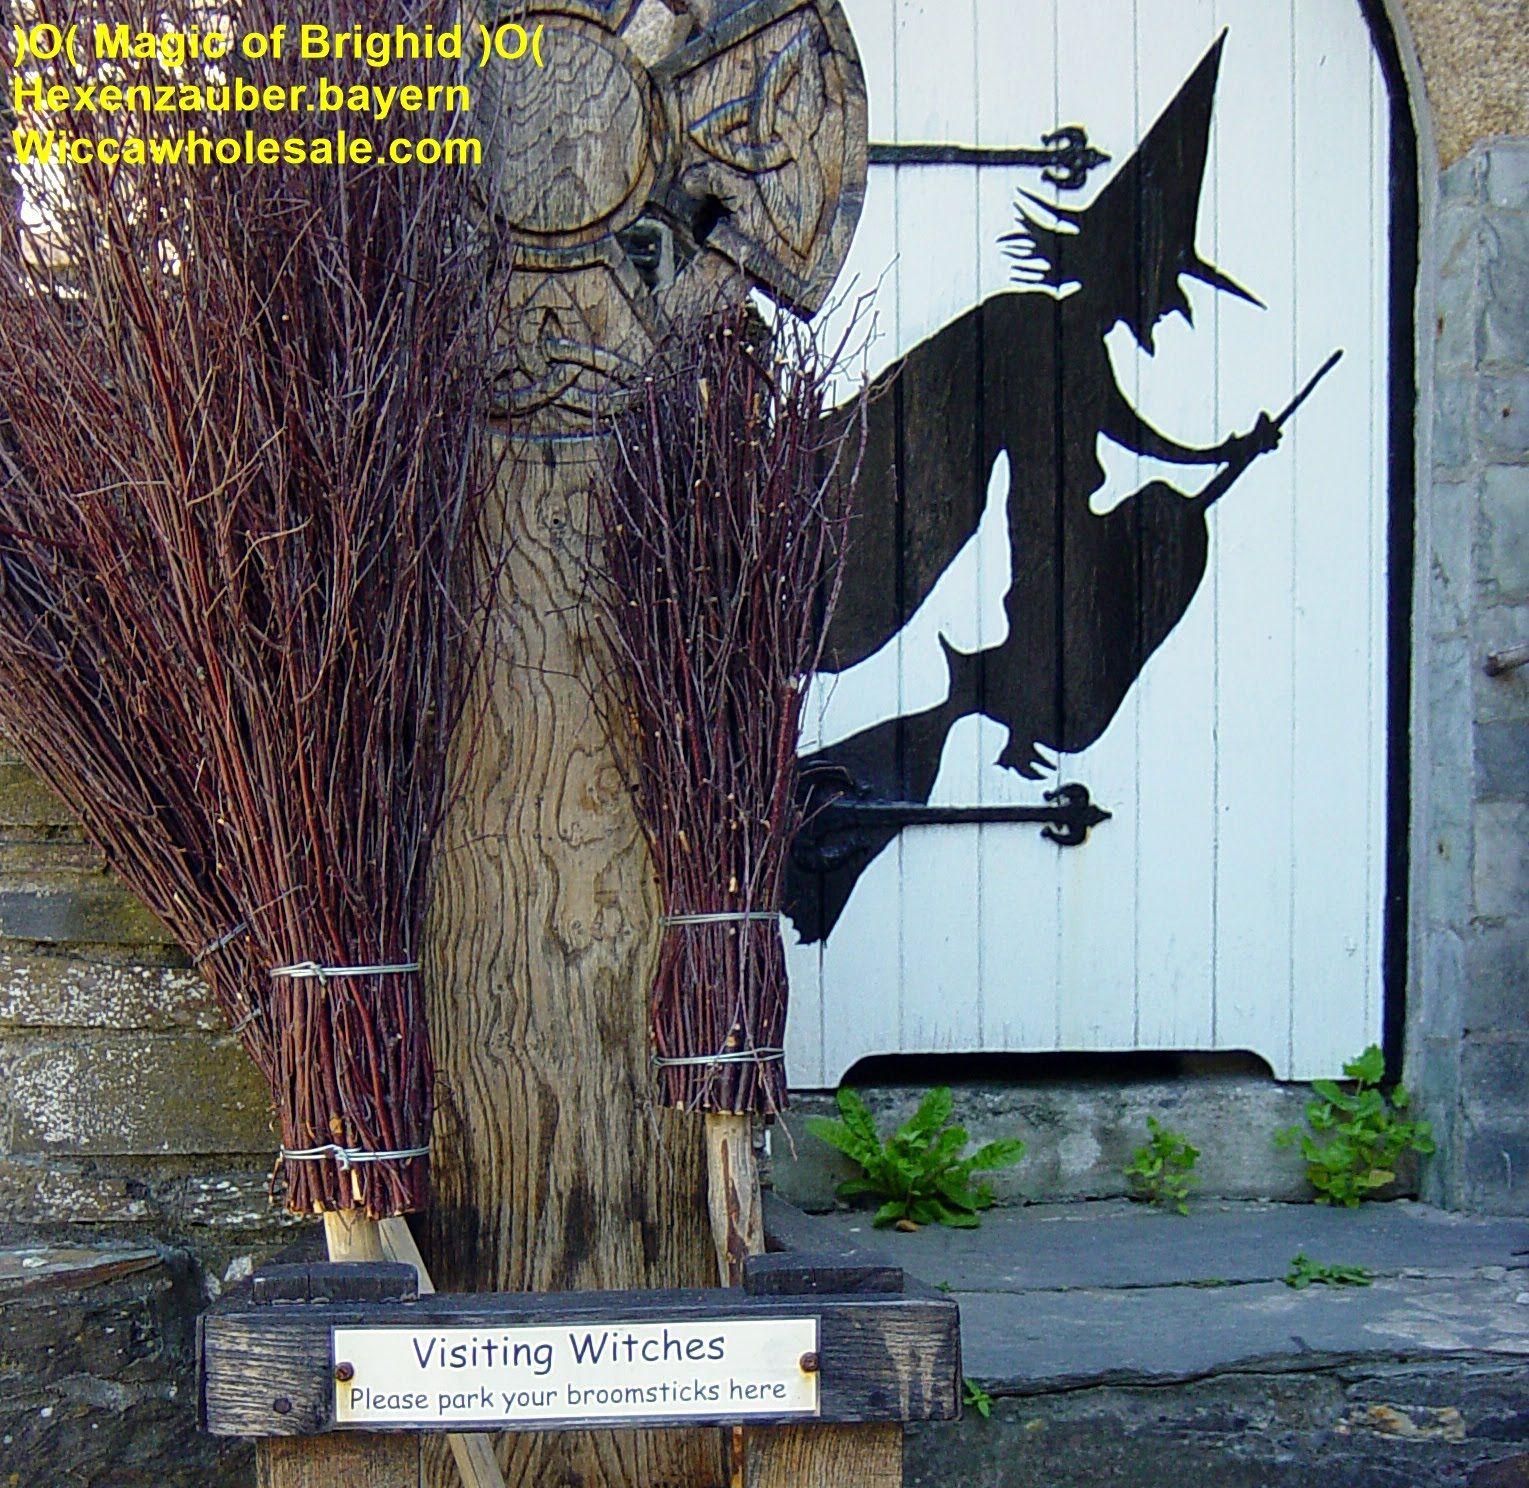 Hexenmuseum, Witchcraft Museum